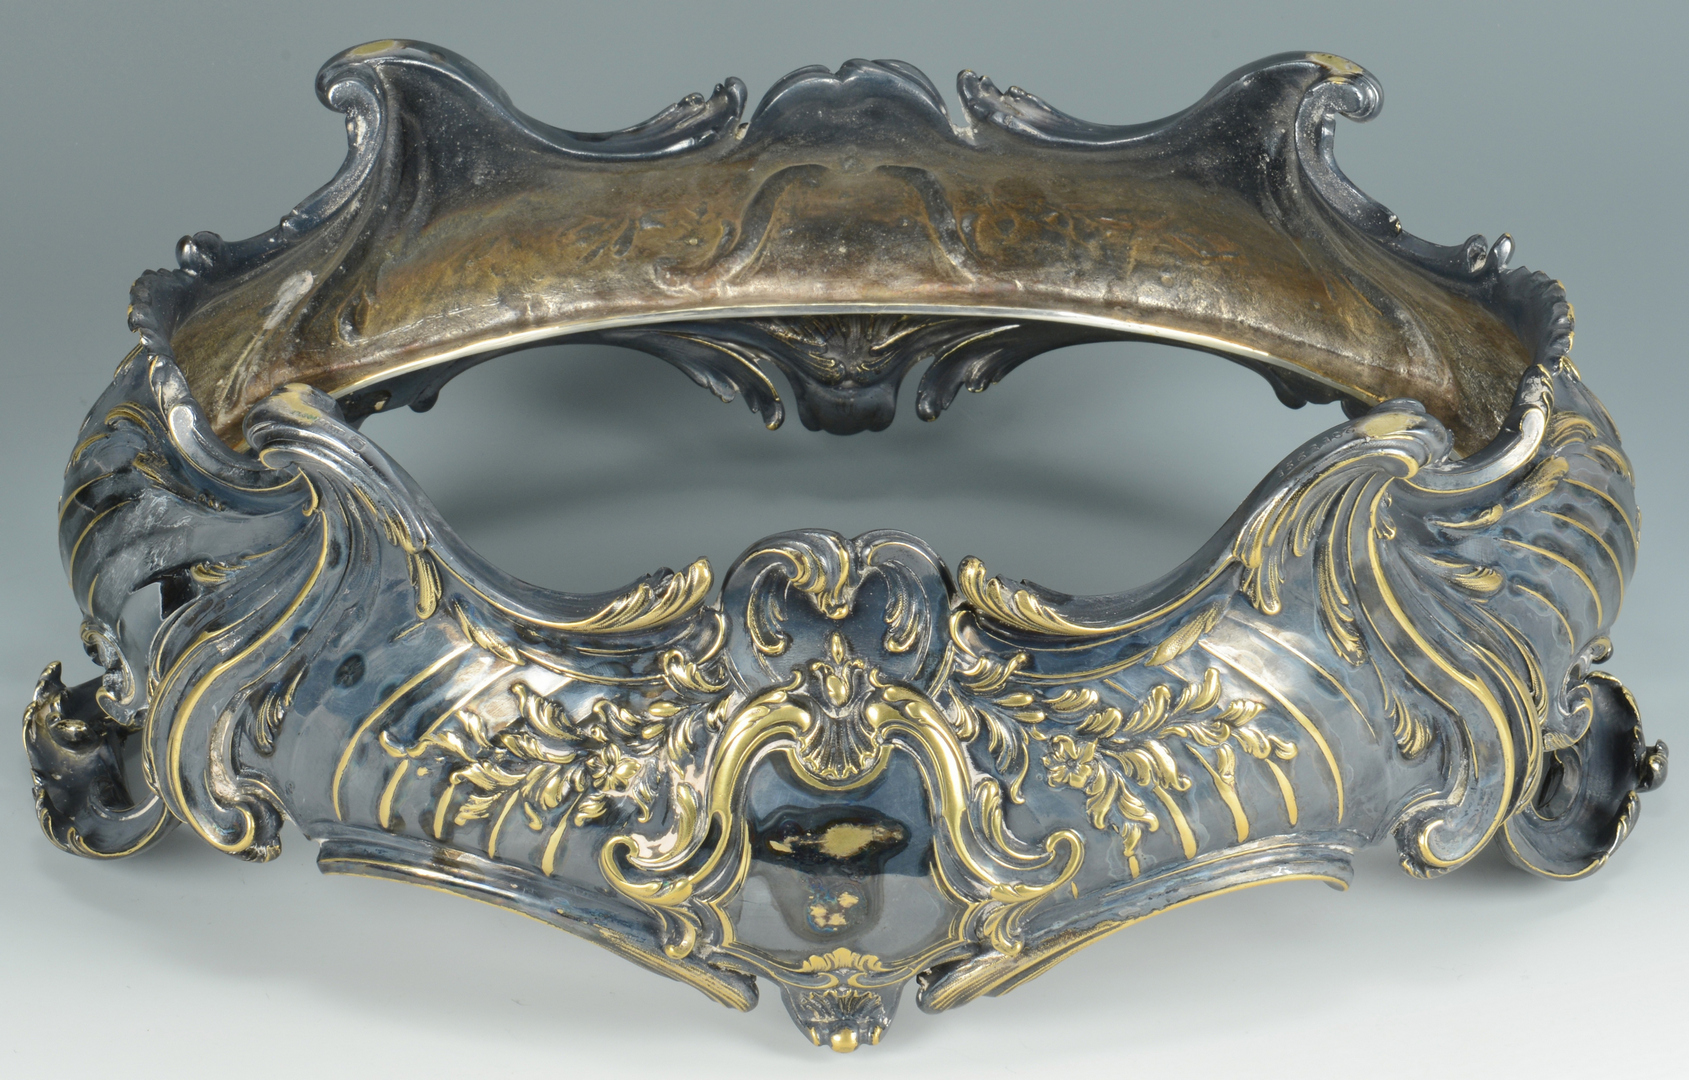 Lot 3088120: Christofle Silver-Bronze Centerpiece